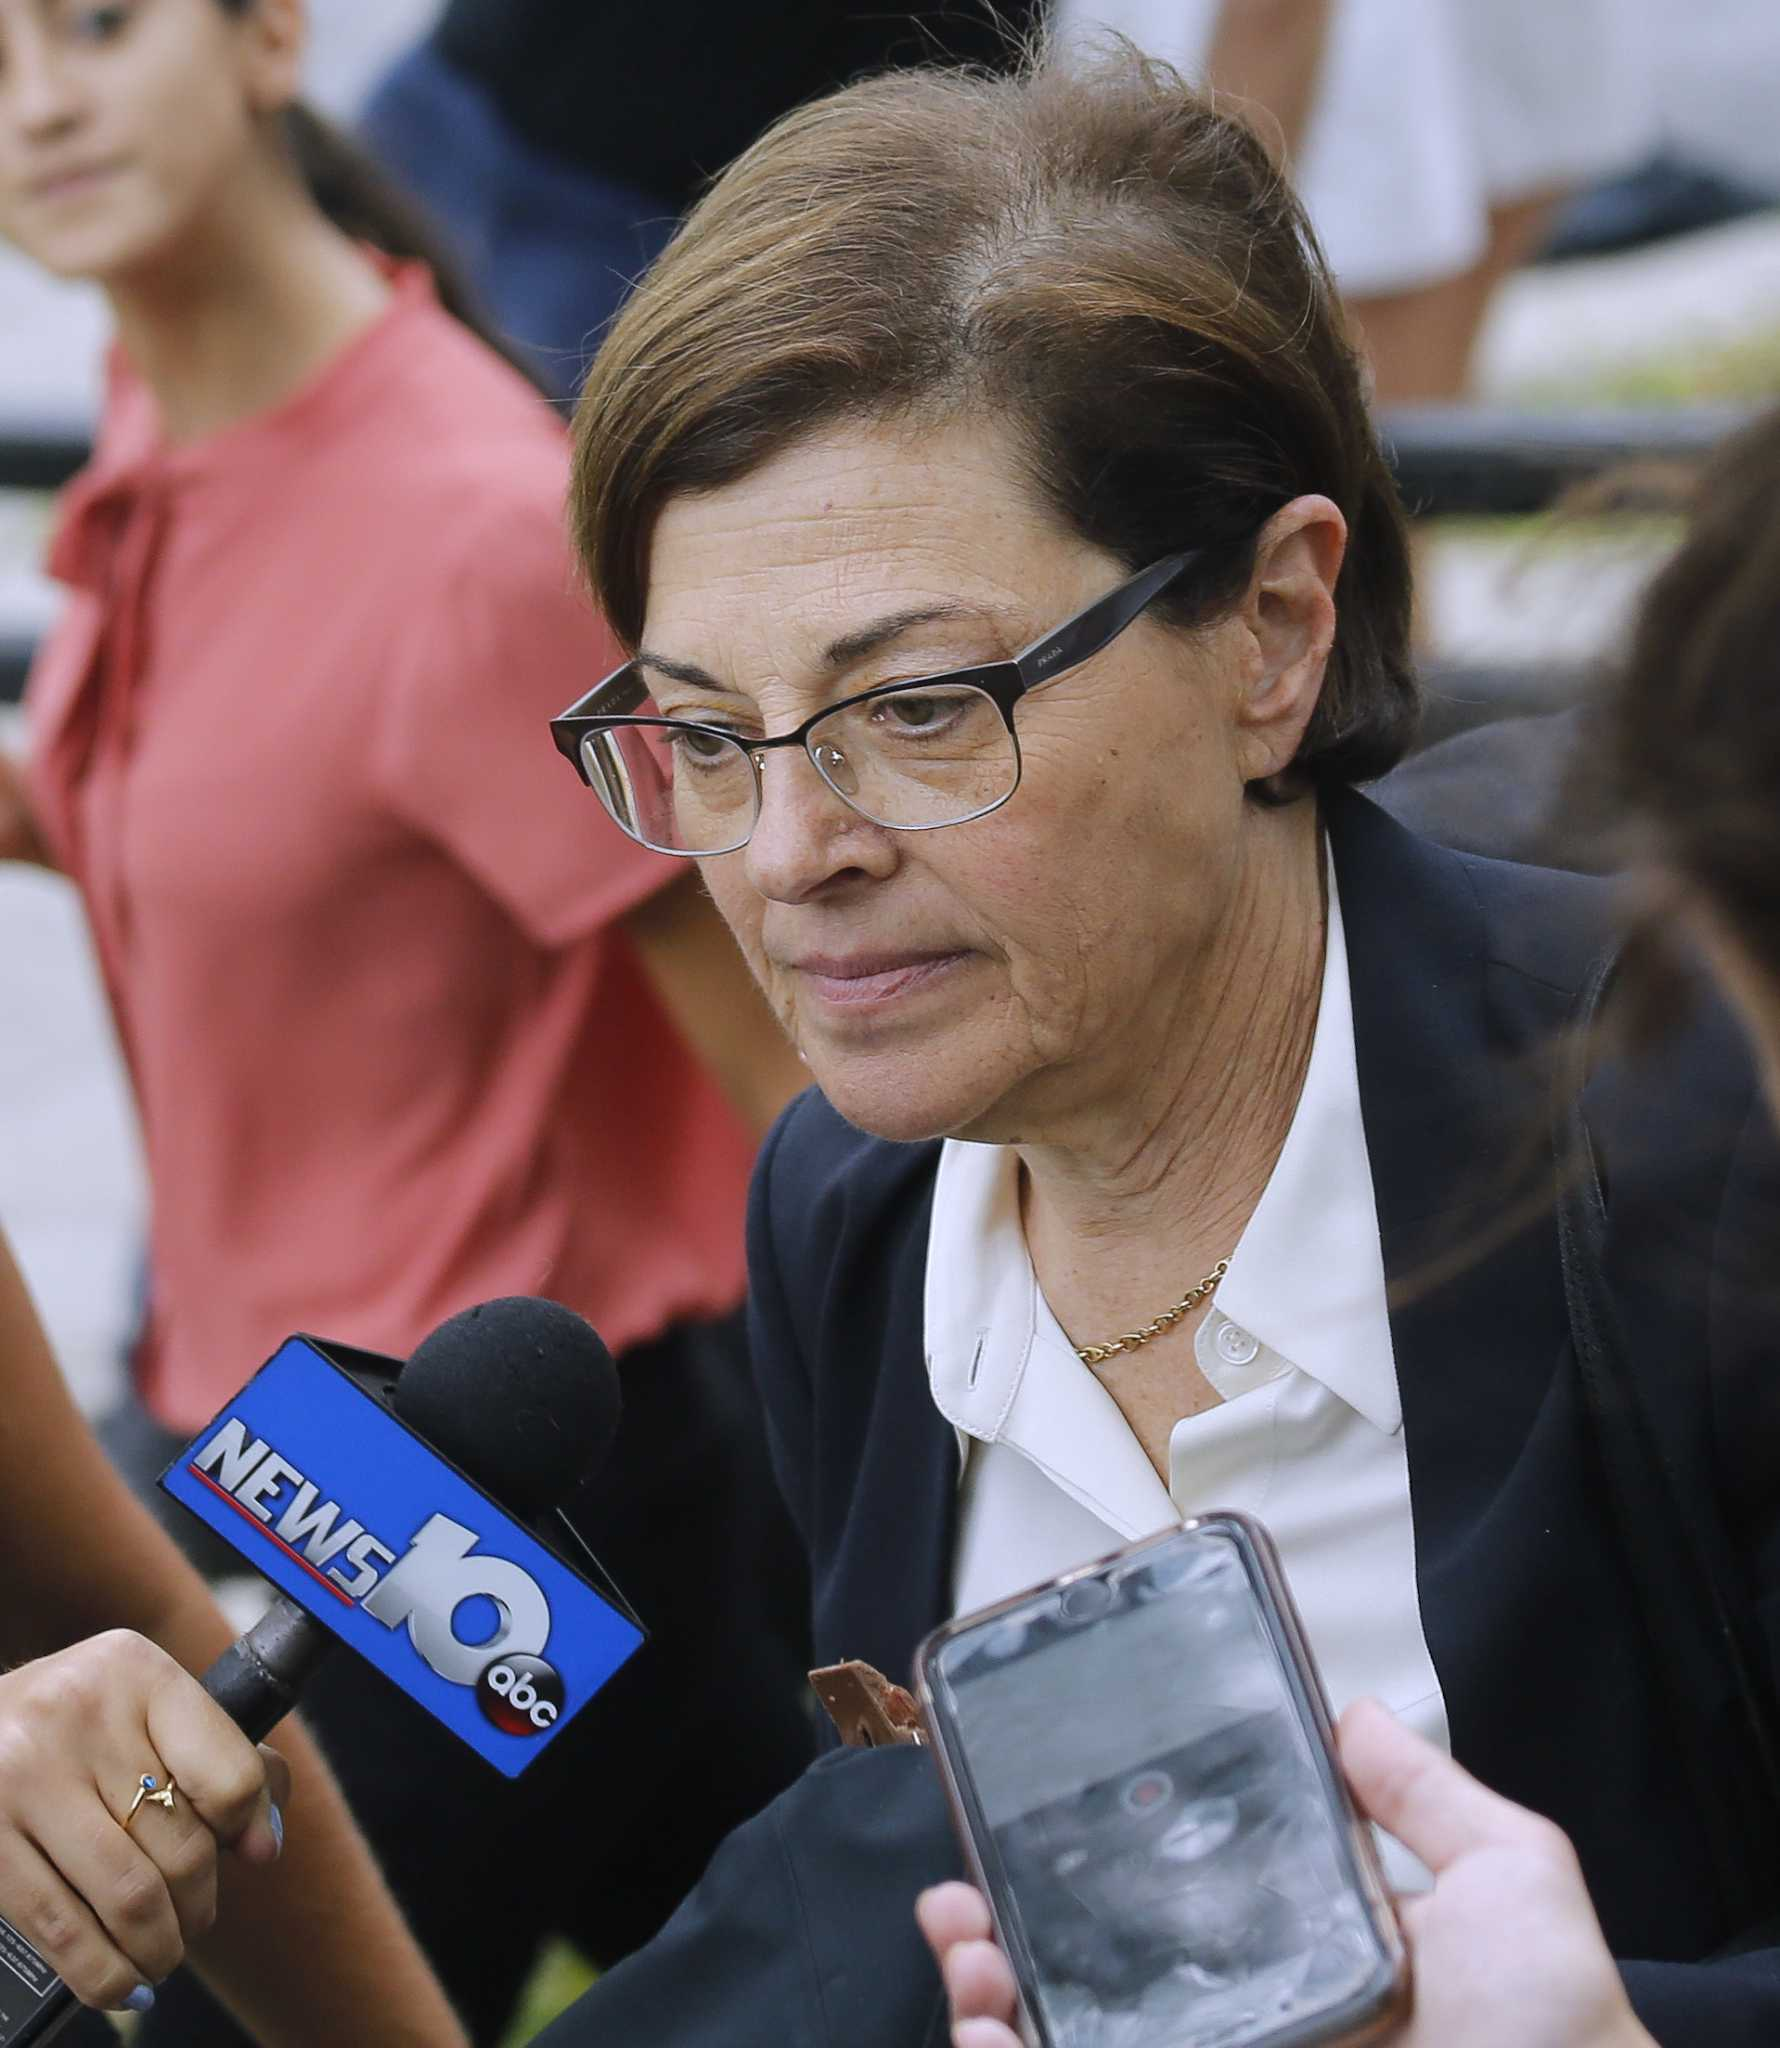 NXIVM President Nancy Salzman to plead guilty